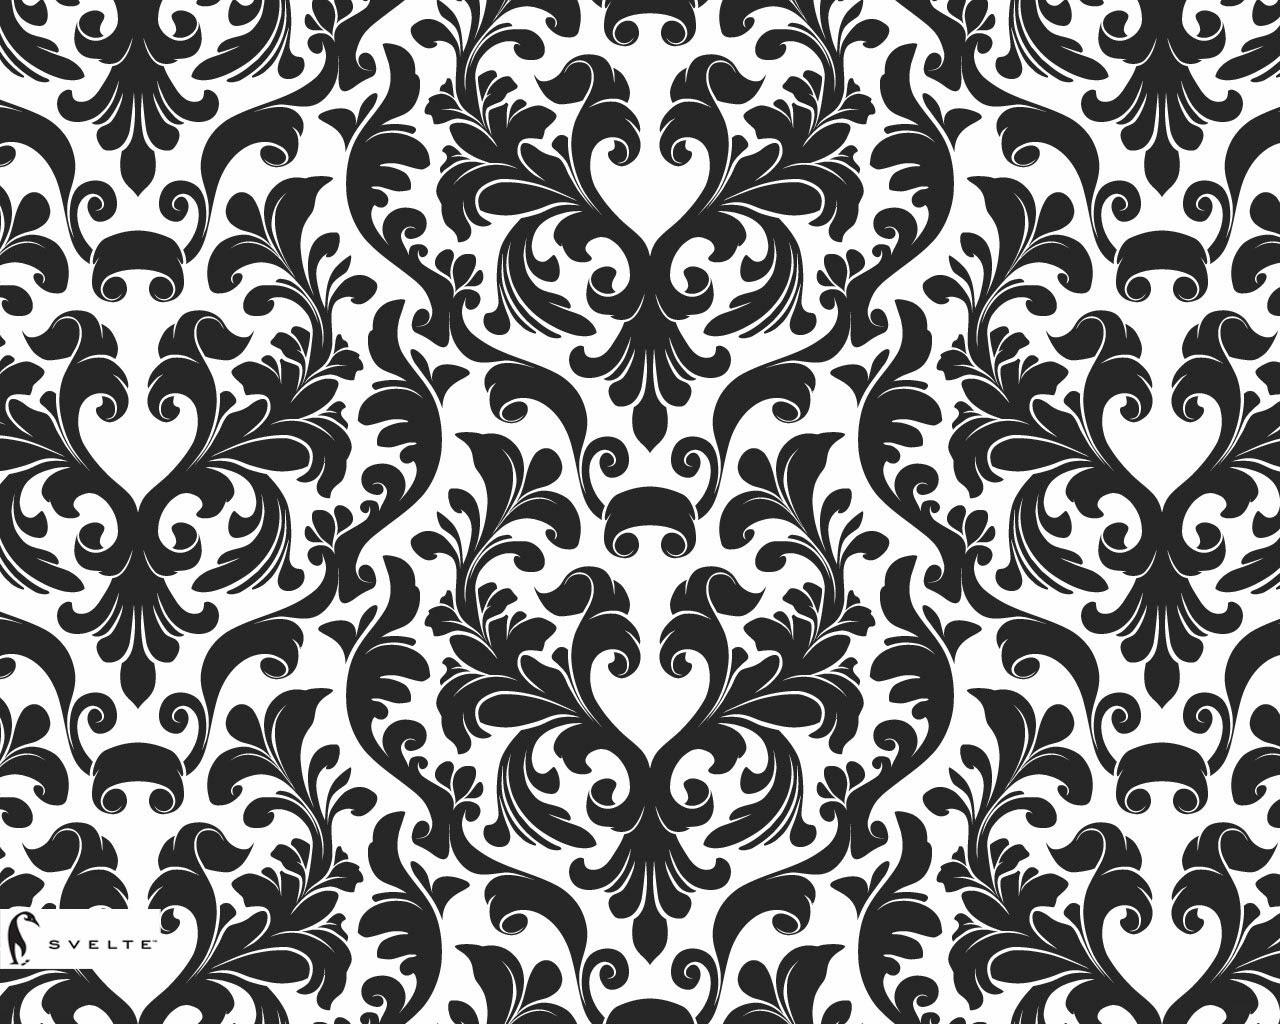 wallpaper black and white damask wallpaper black and white damask 1280x1024